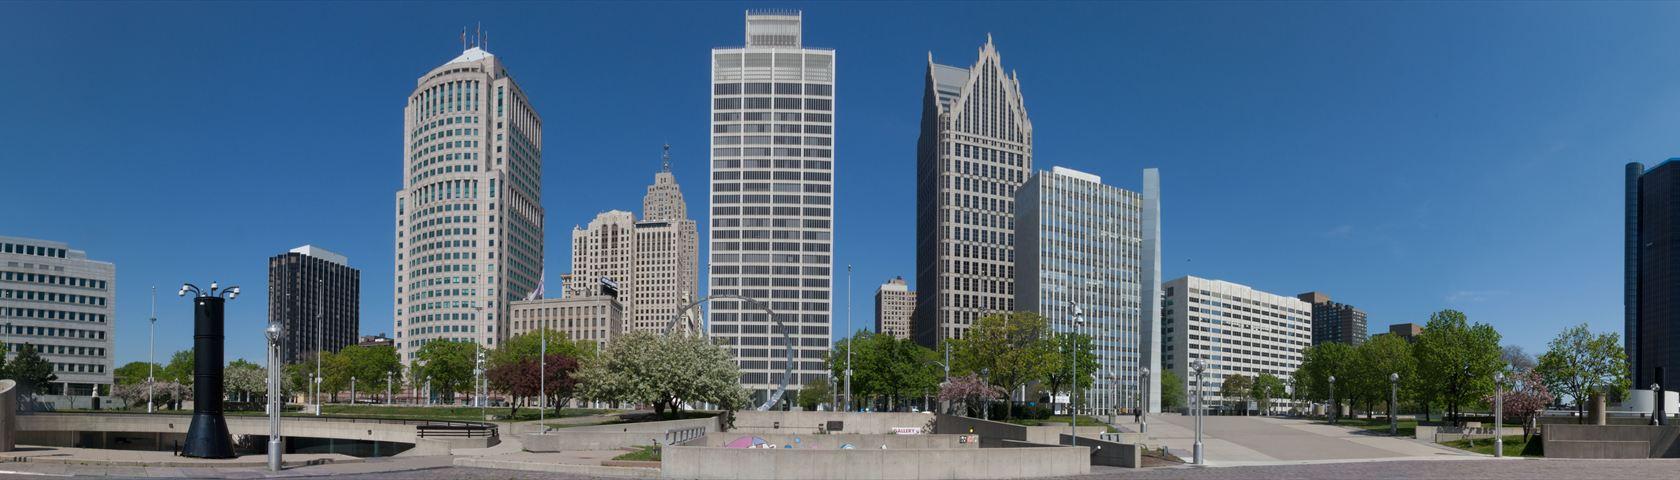 Hart Plaza, Downtown Detroit Michigan